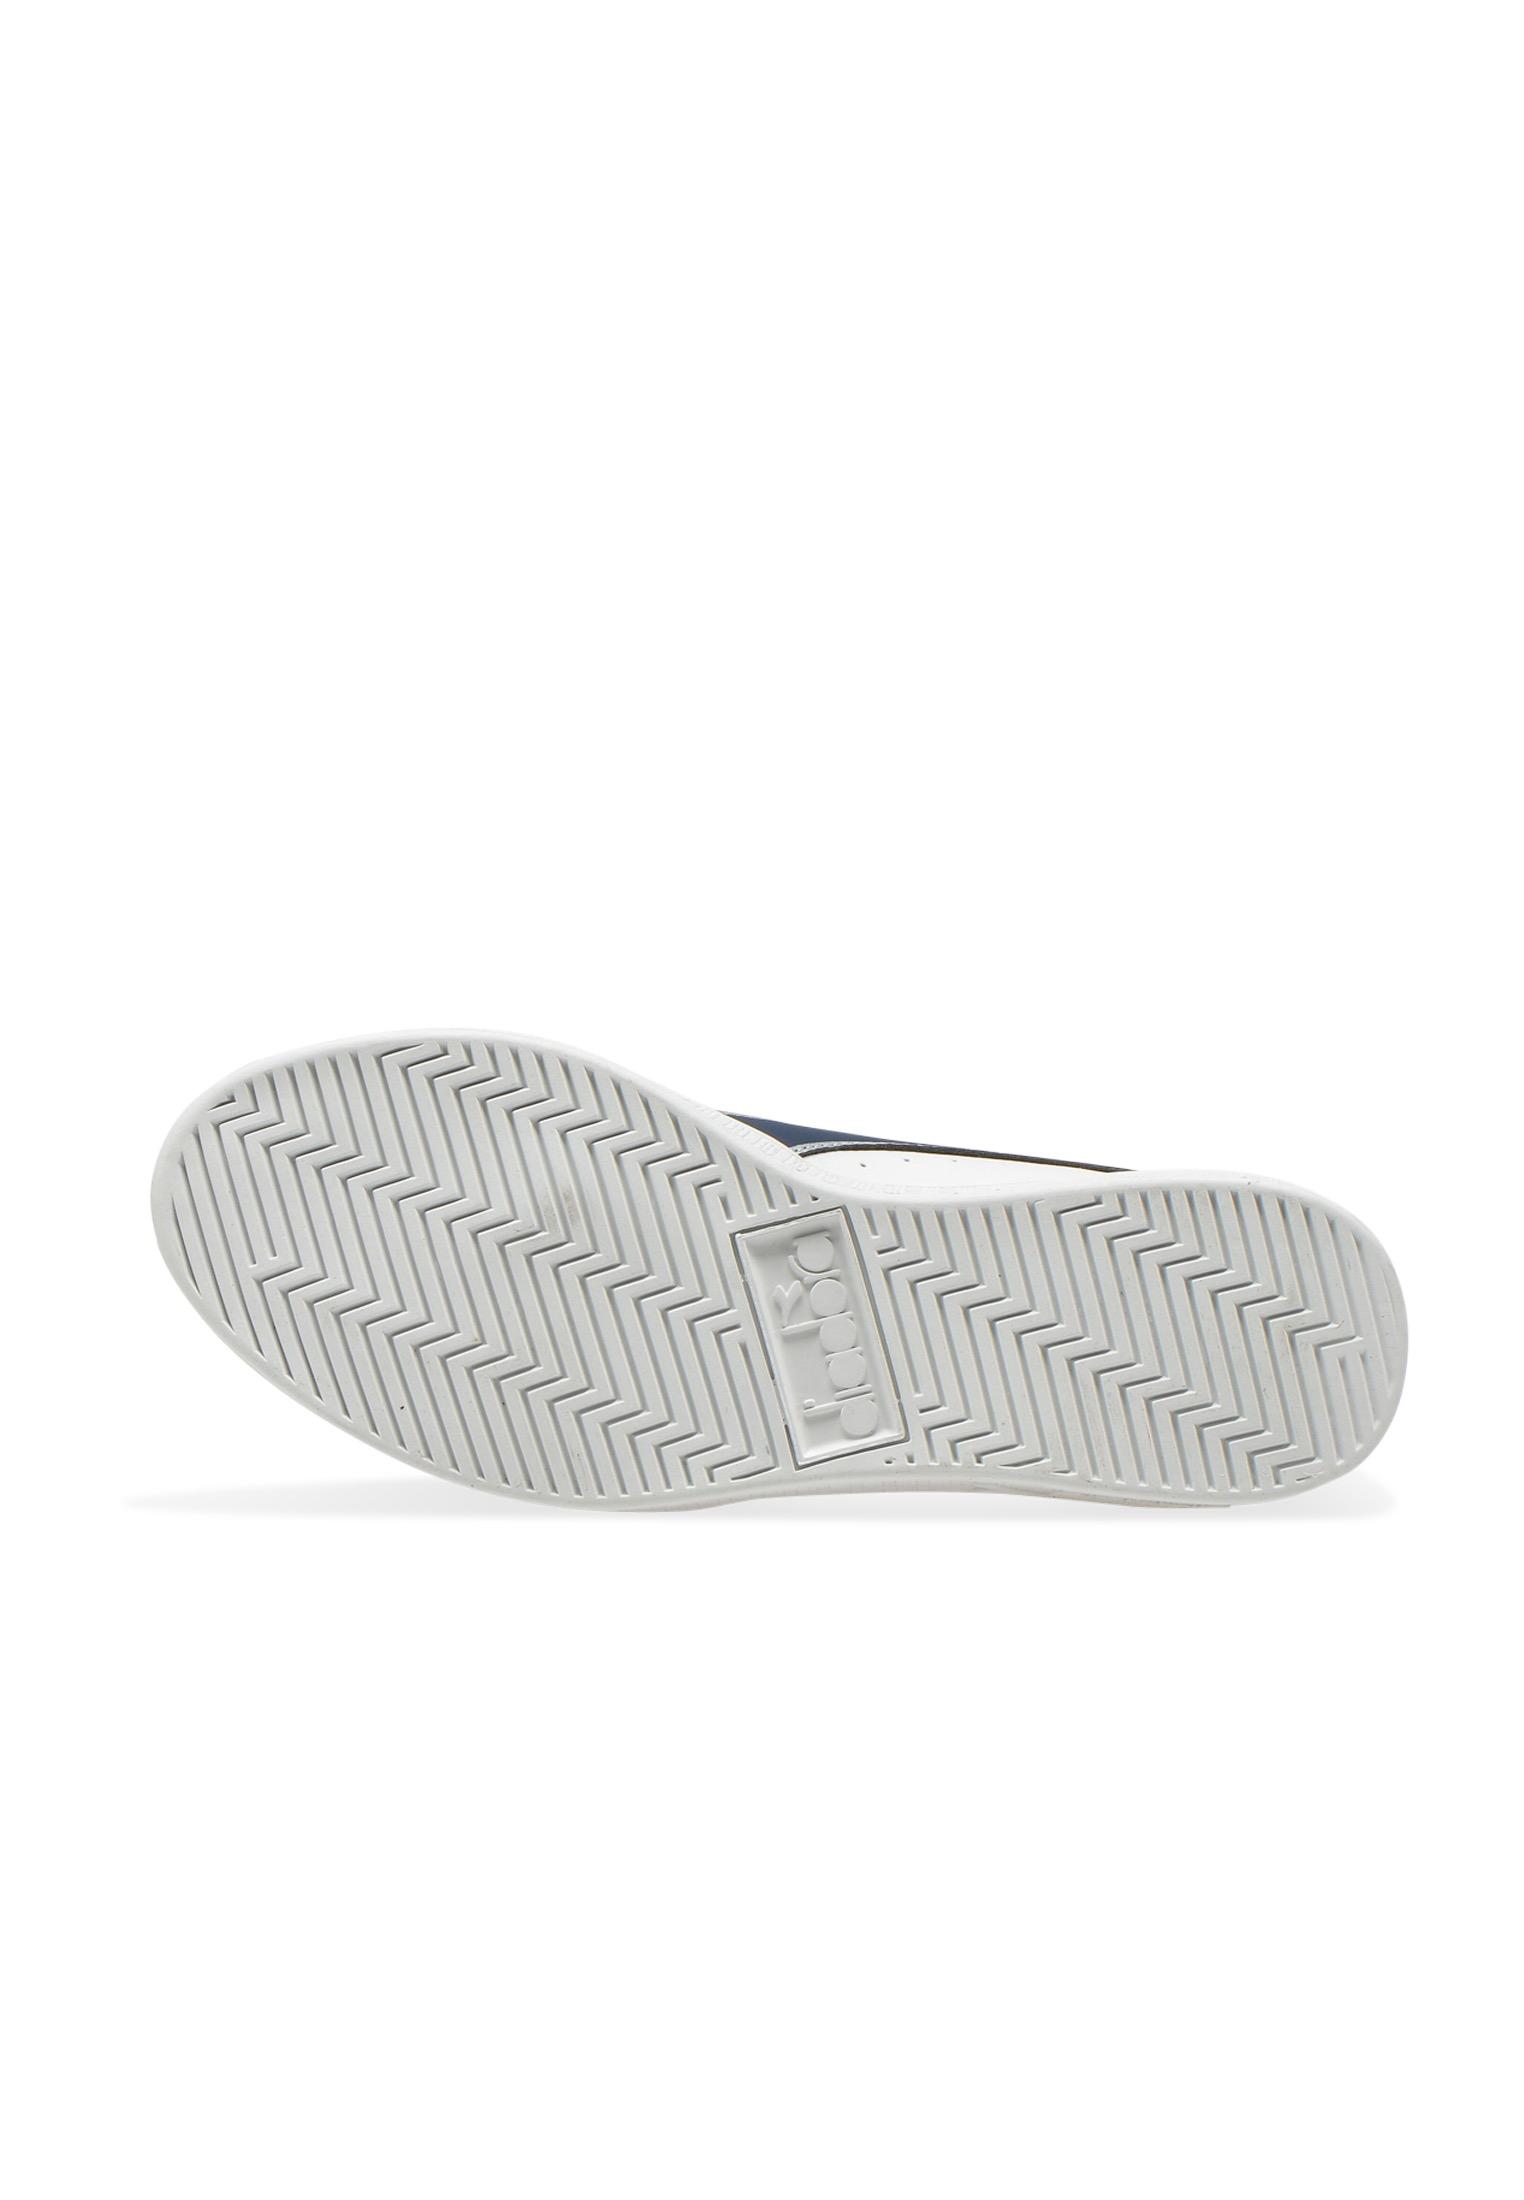 Diadora-Sneakers-GAME-P-WN-para-hombre-y-mujer miniatura 28